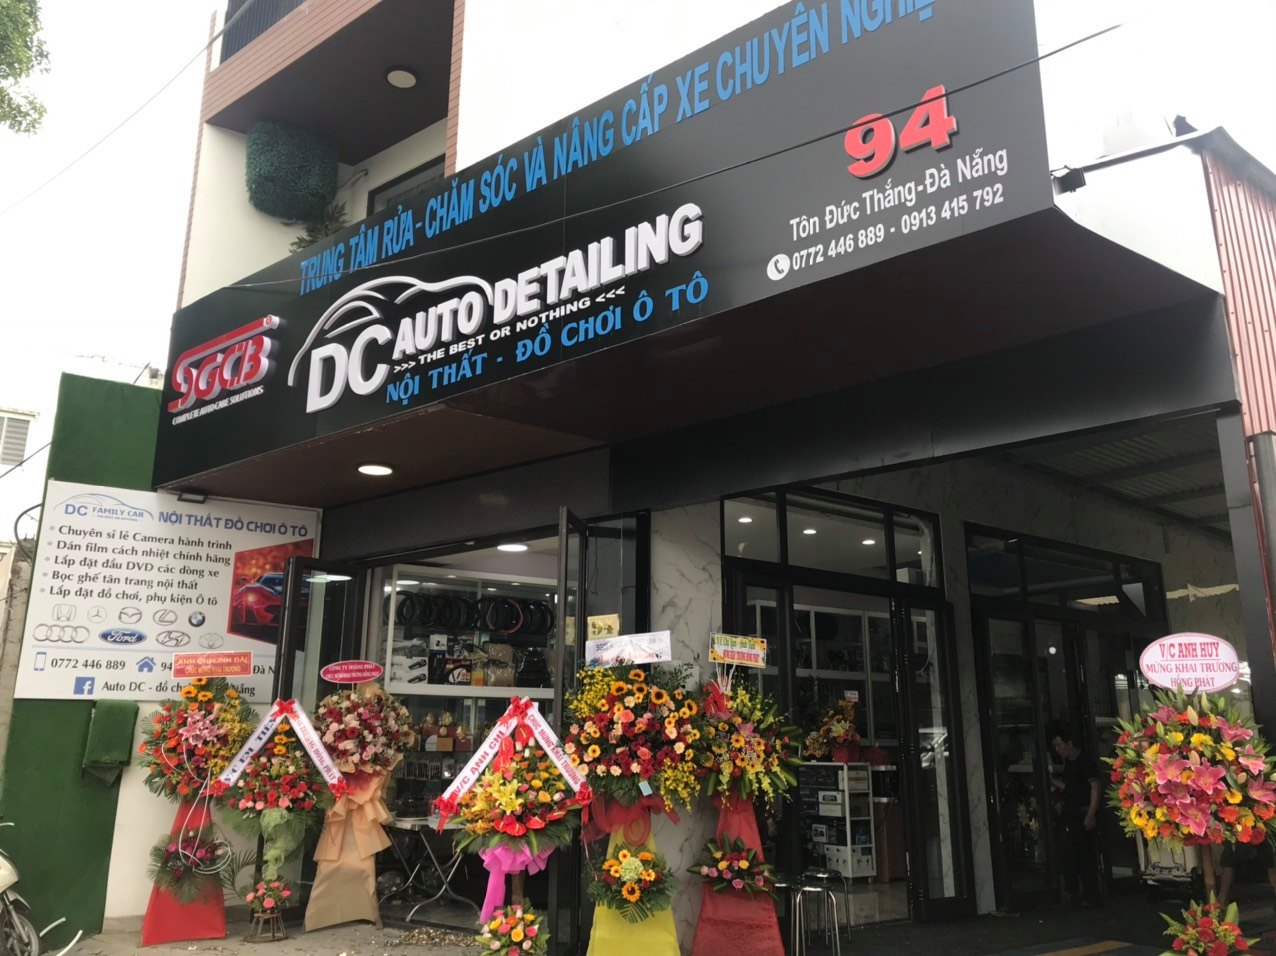 mung-dc-auto-detailing-khai-truong-dai-ly-sgcb-1